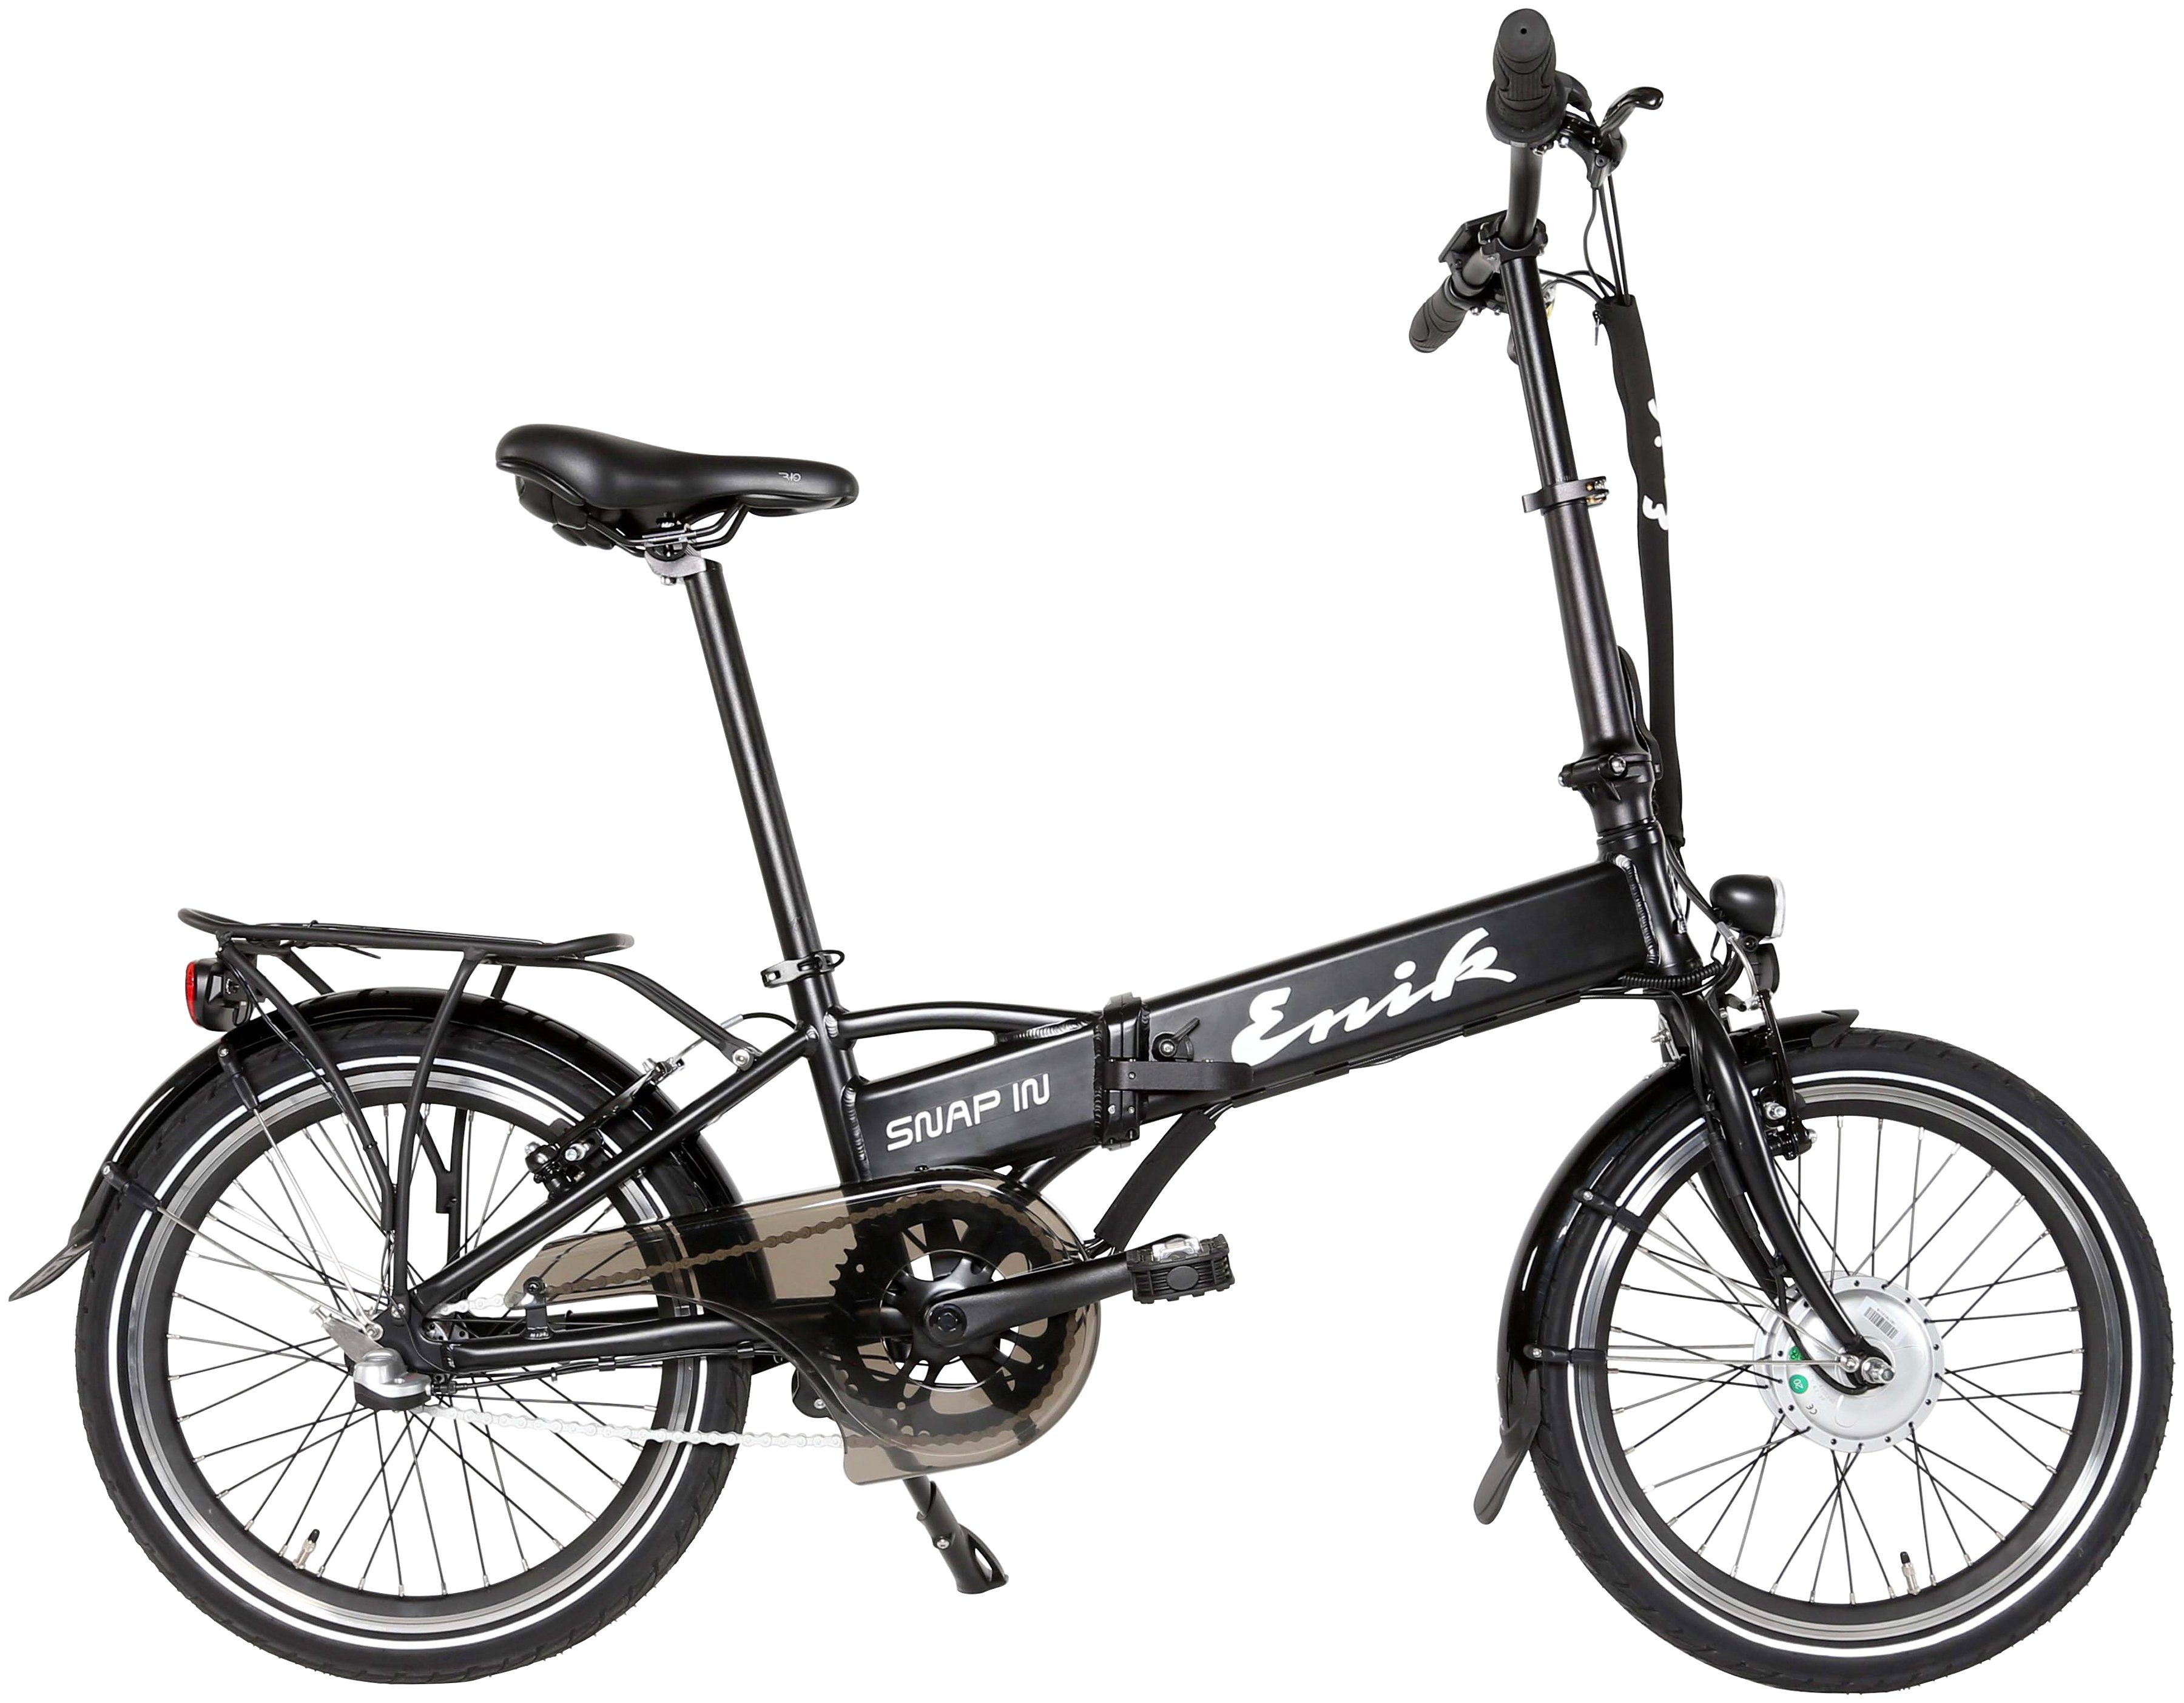 ENIK E-Bike Klapprad »SNAP-IN 20«, 20 Zoll, 3 Gang, Frontmotor, 317 Wh